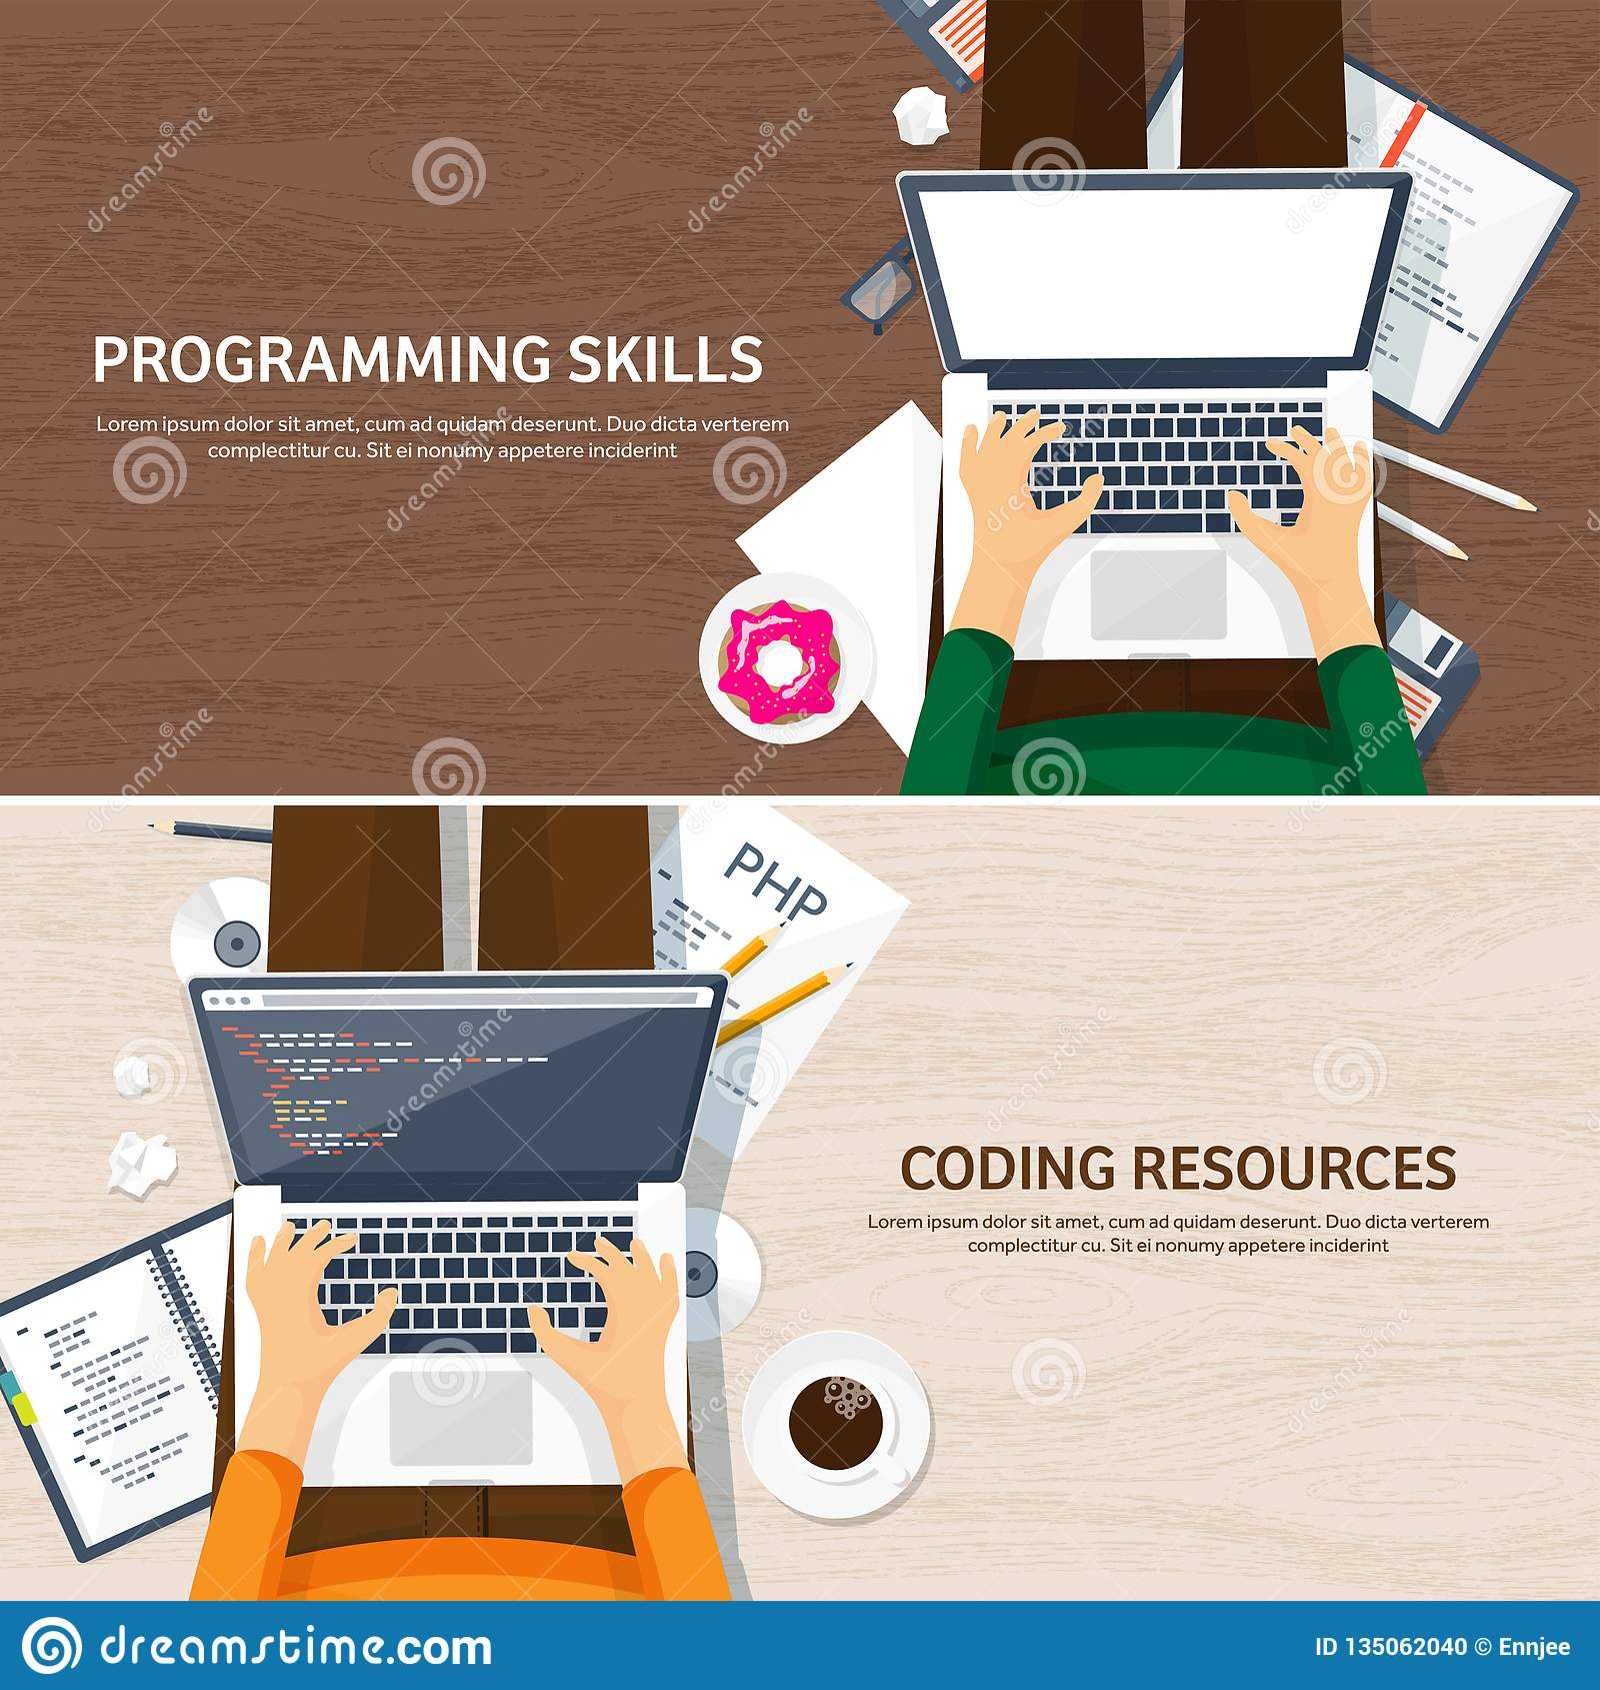 Programming,coding. Flat computing background. Code, hardware,software. Web development. Search engine optimization